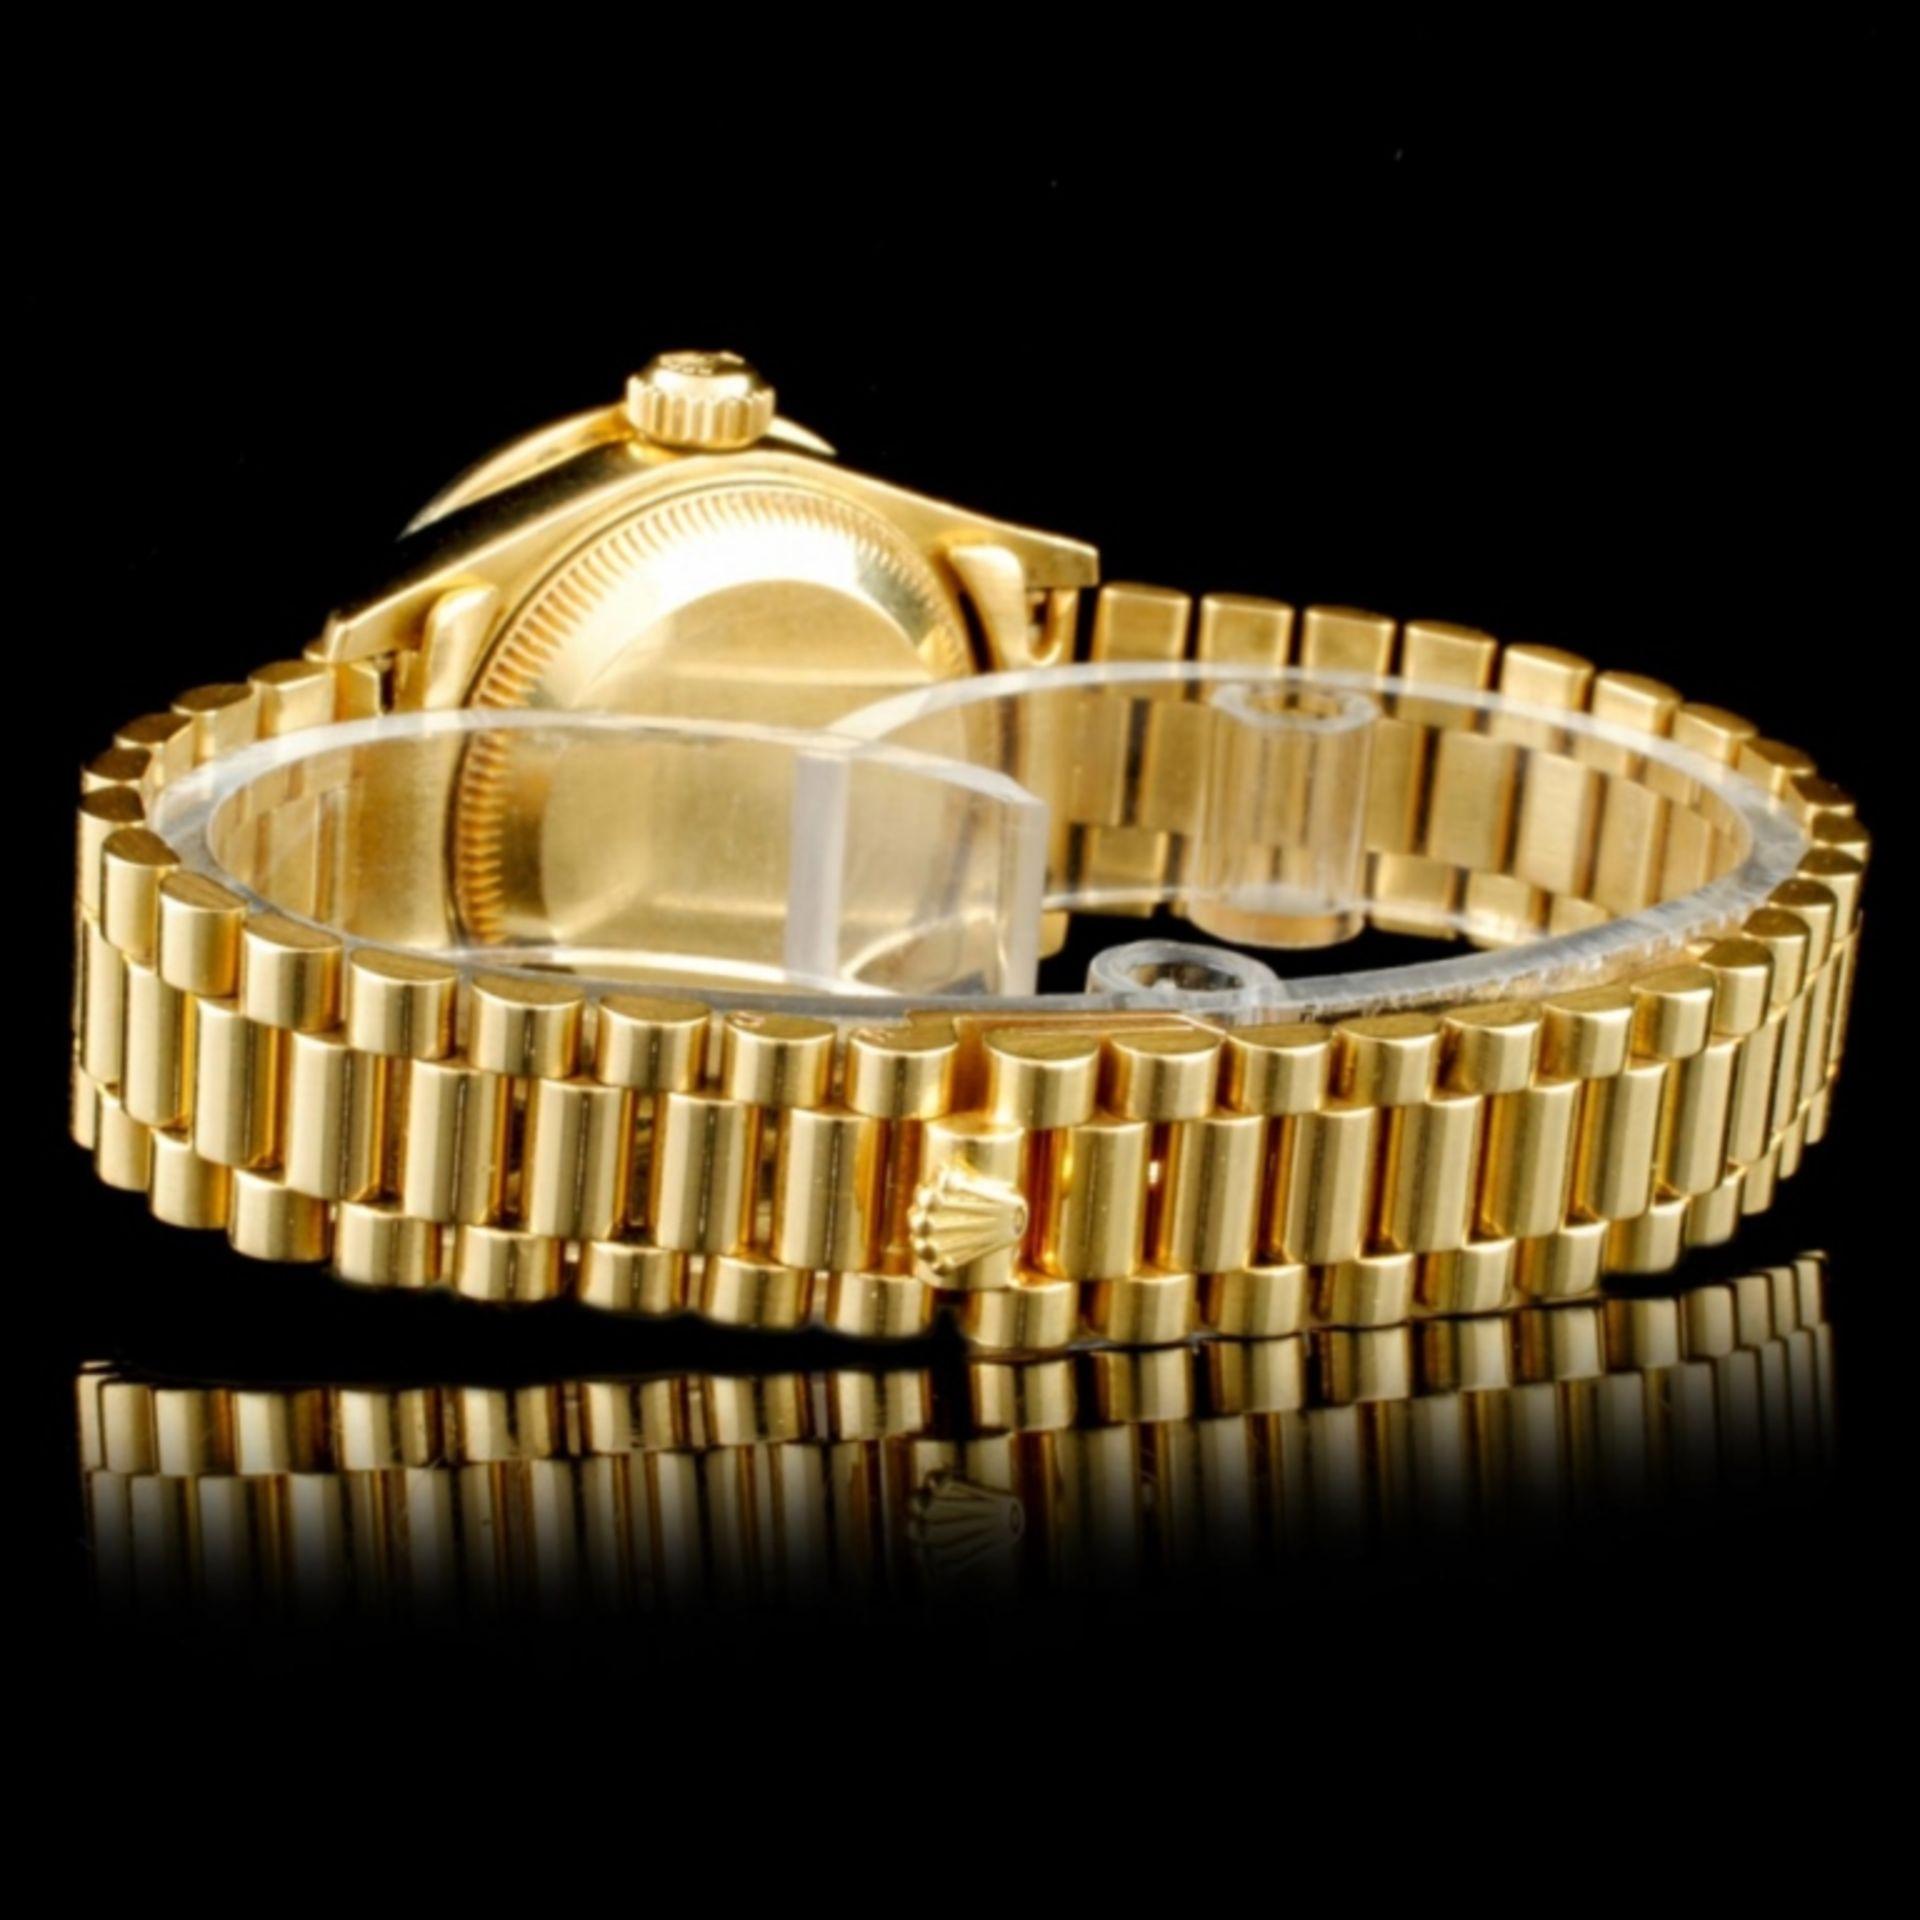 Rolex DateJust 18K YG Diamond 26MM Watch - Image 4 of 6